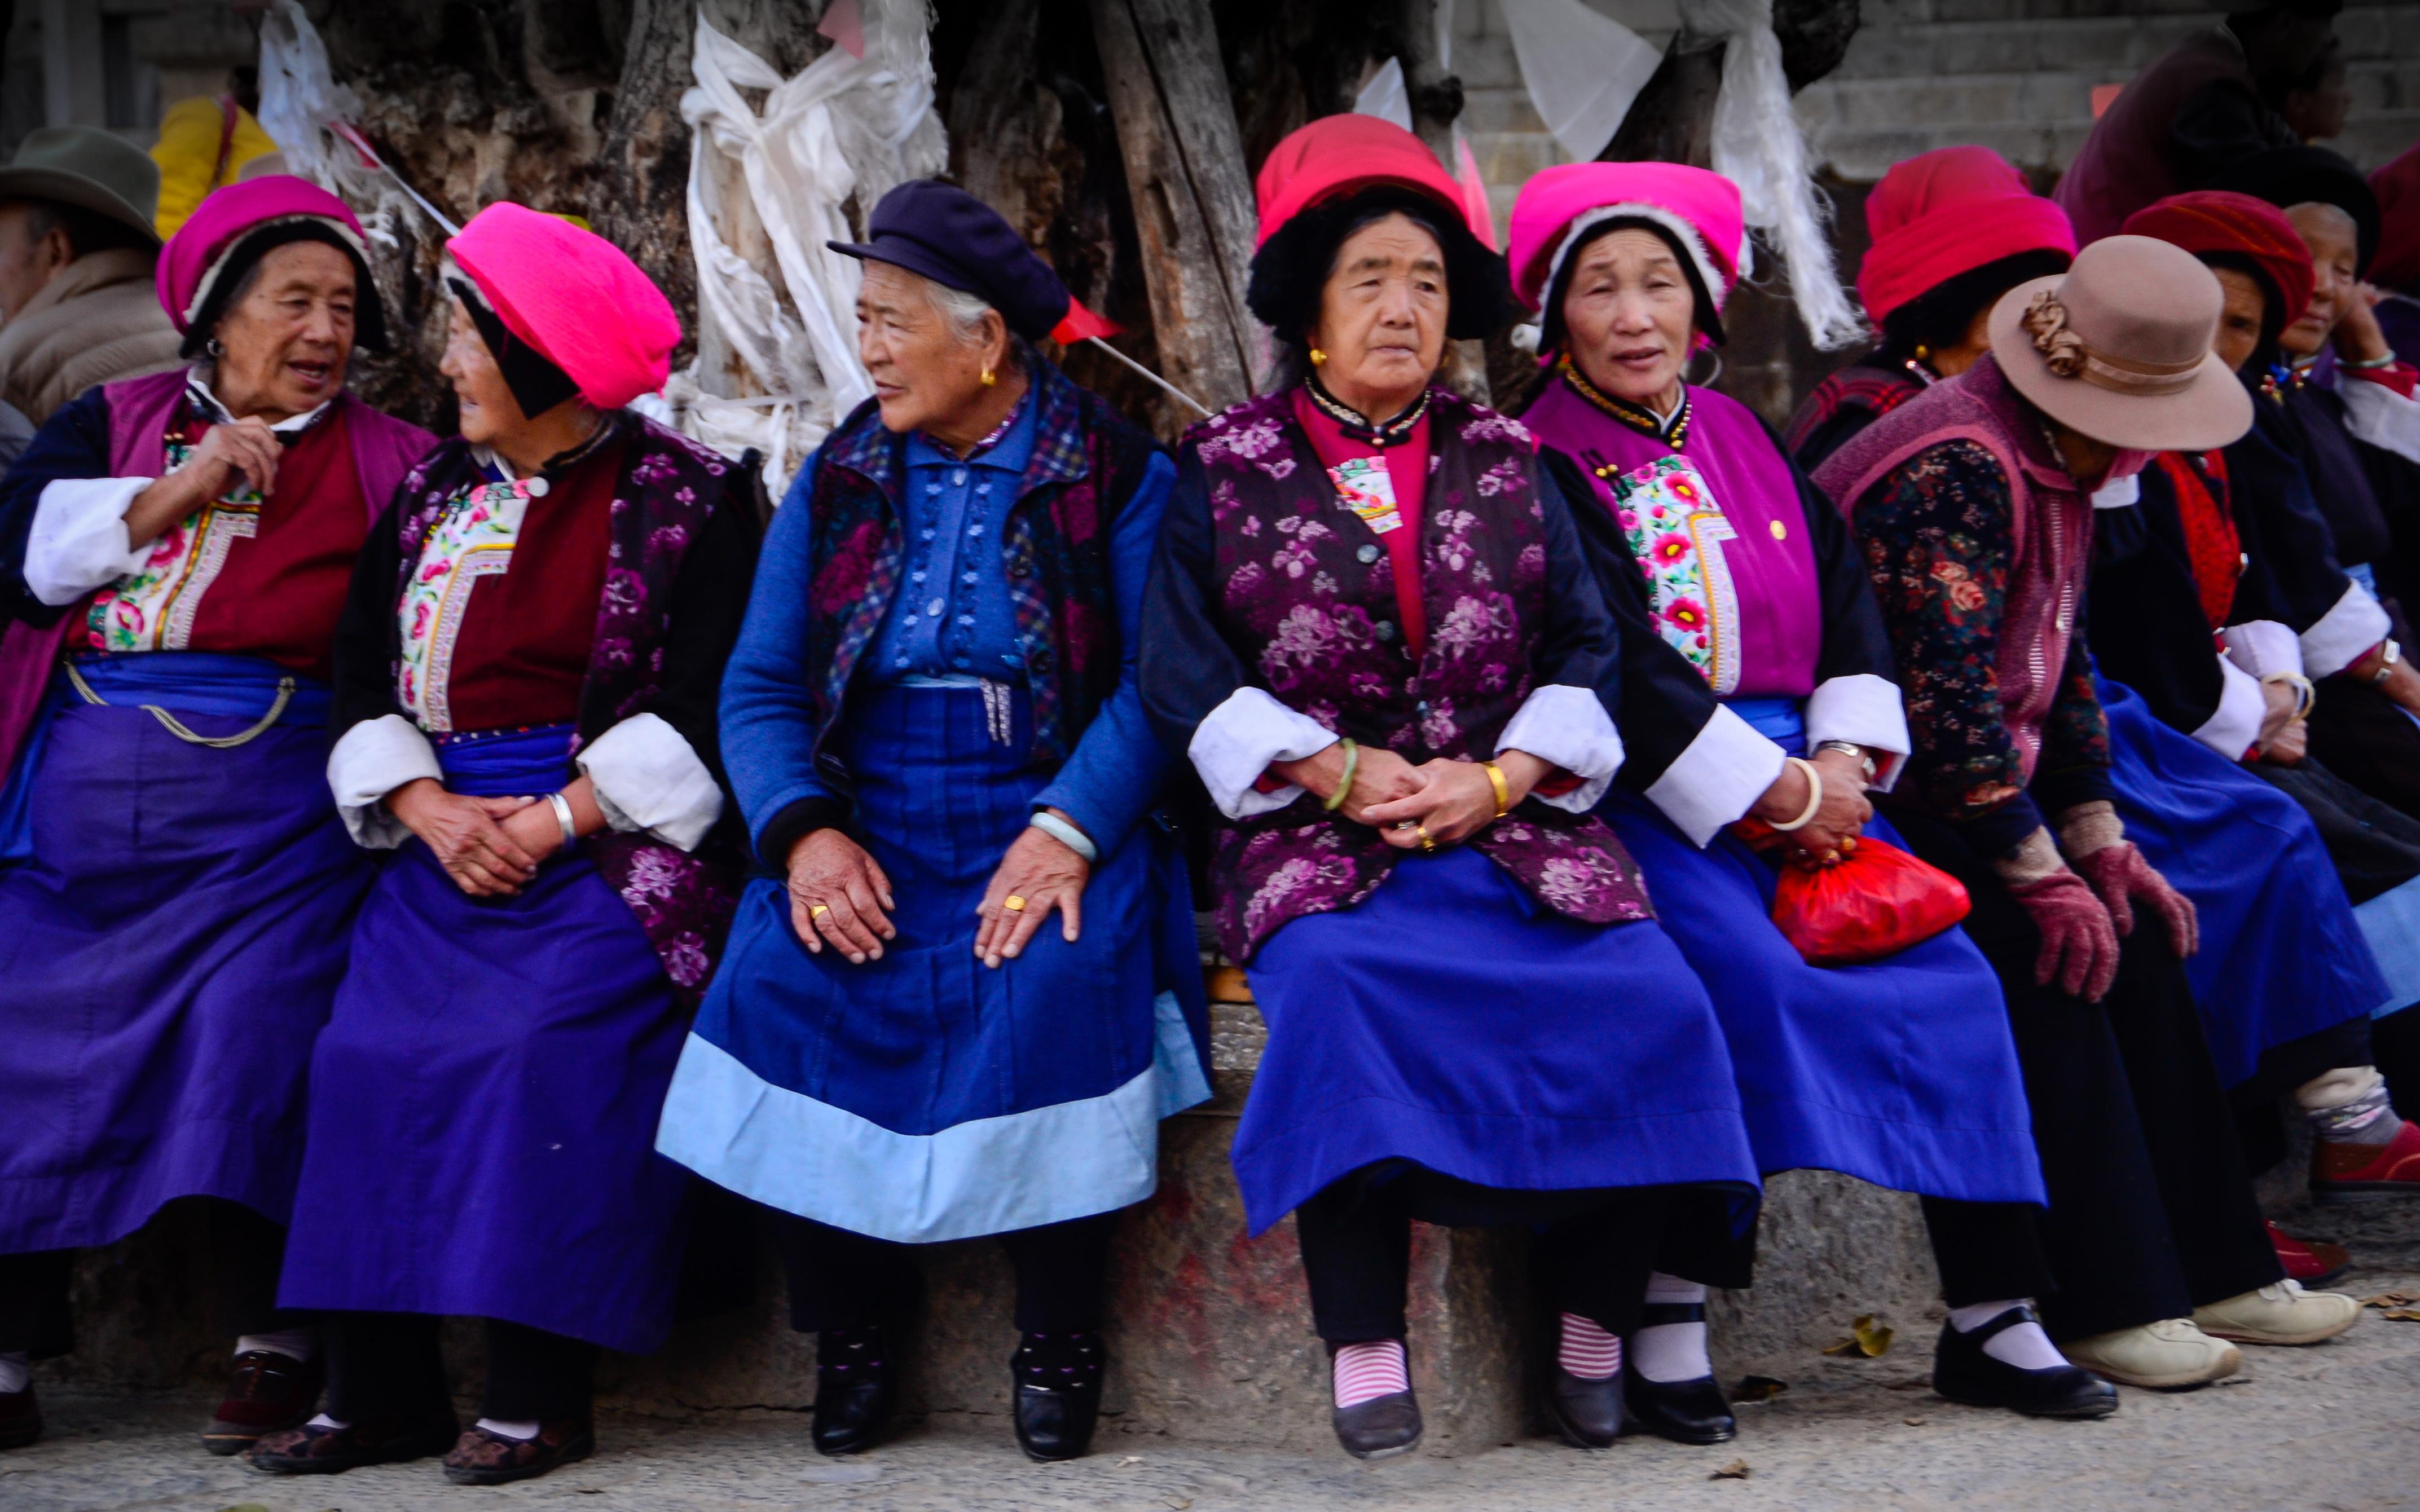 Tibetan women in China.